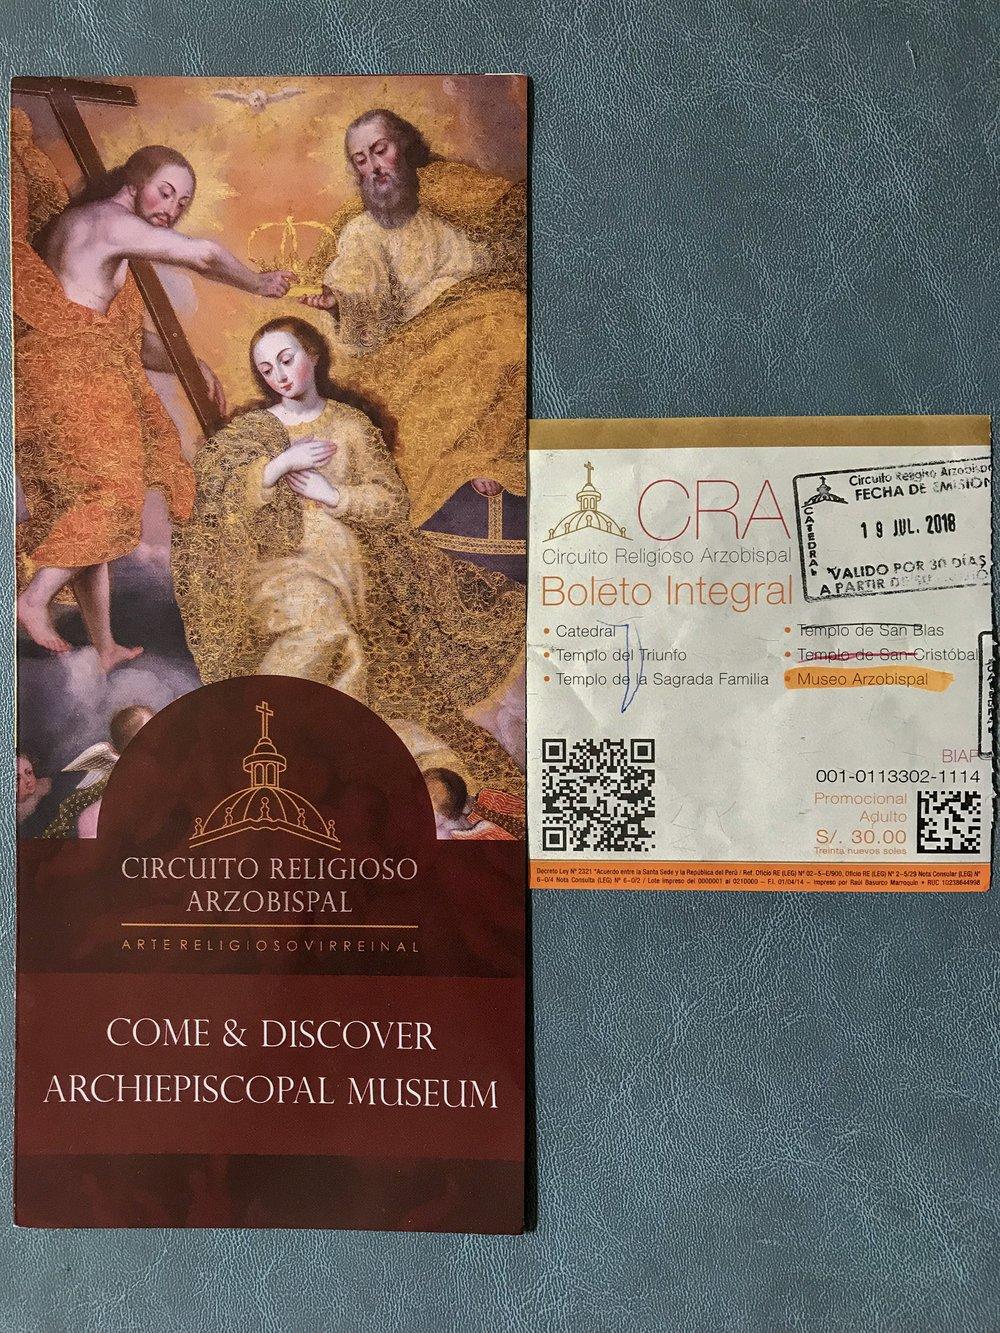 Circuito Religioso Arzobispal Ticket